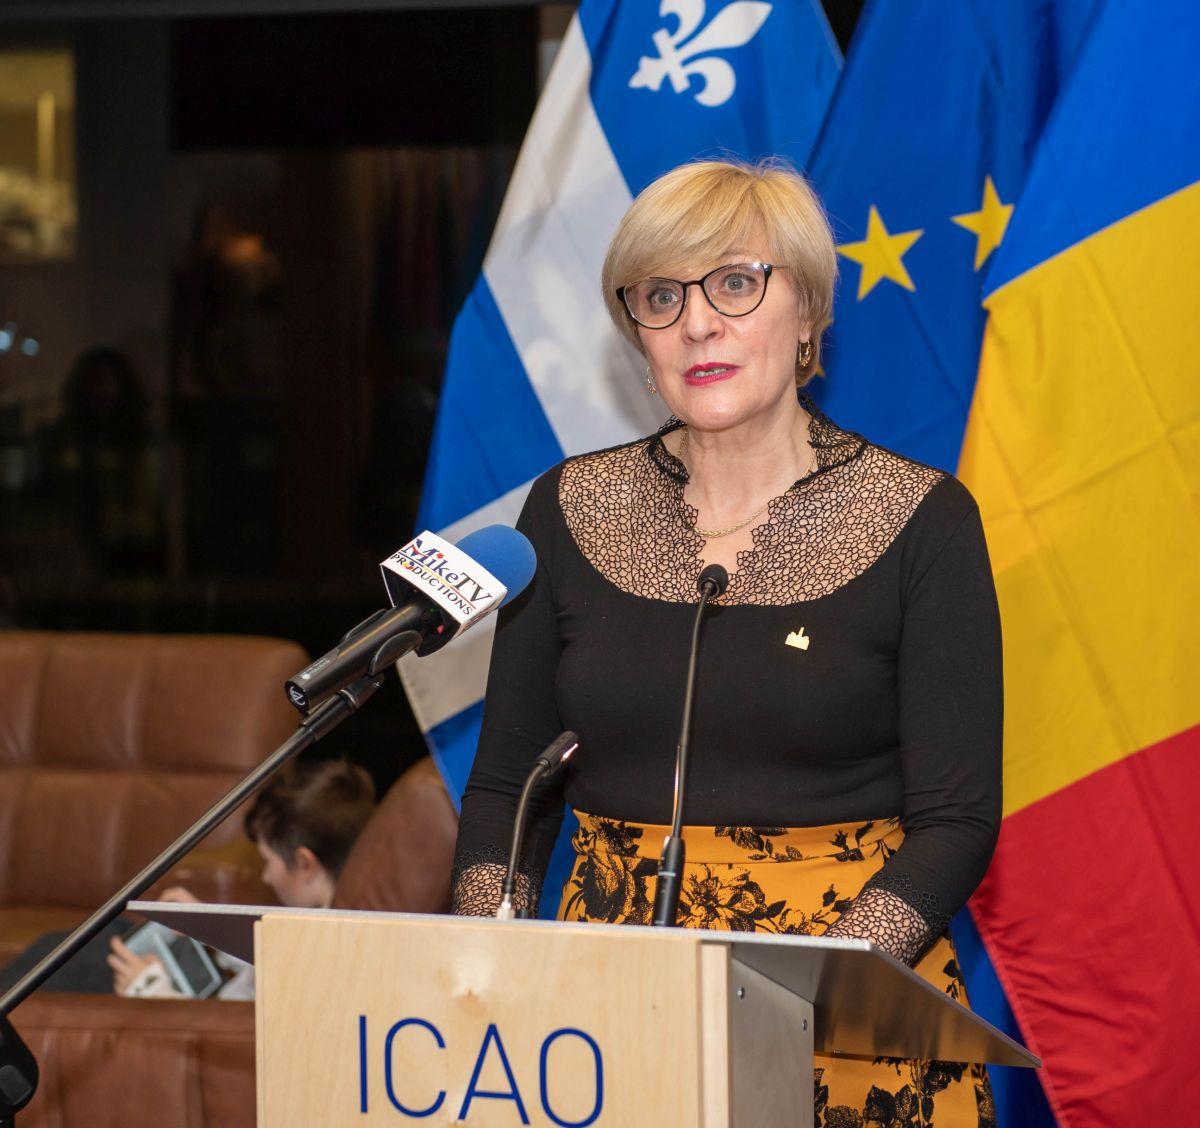 Magda Popeanu